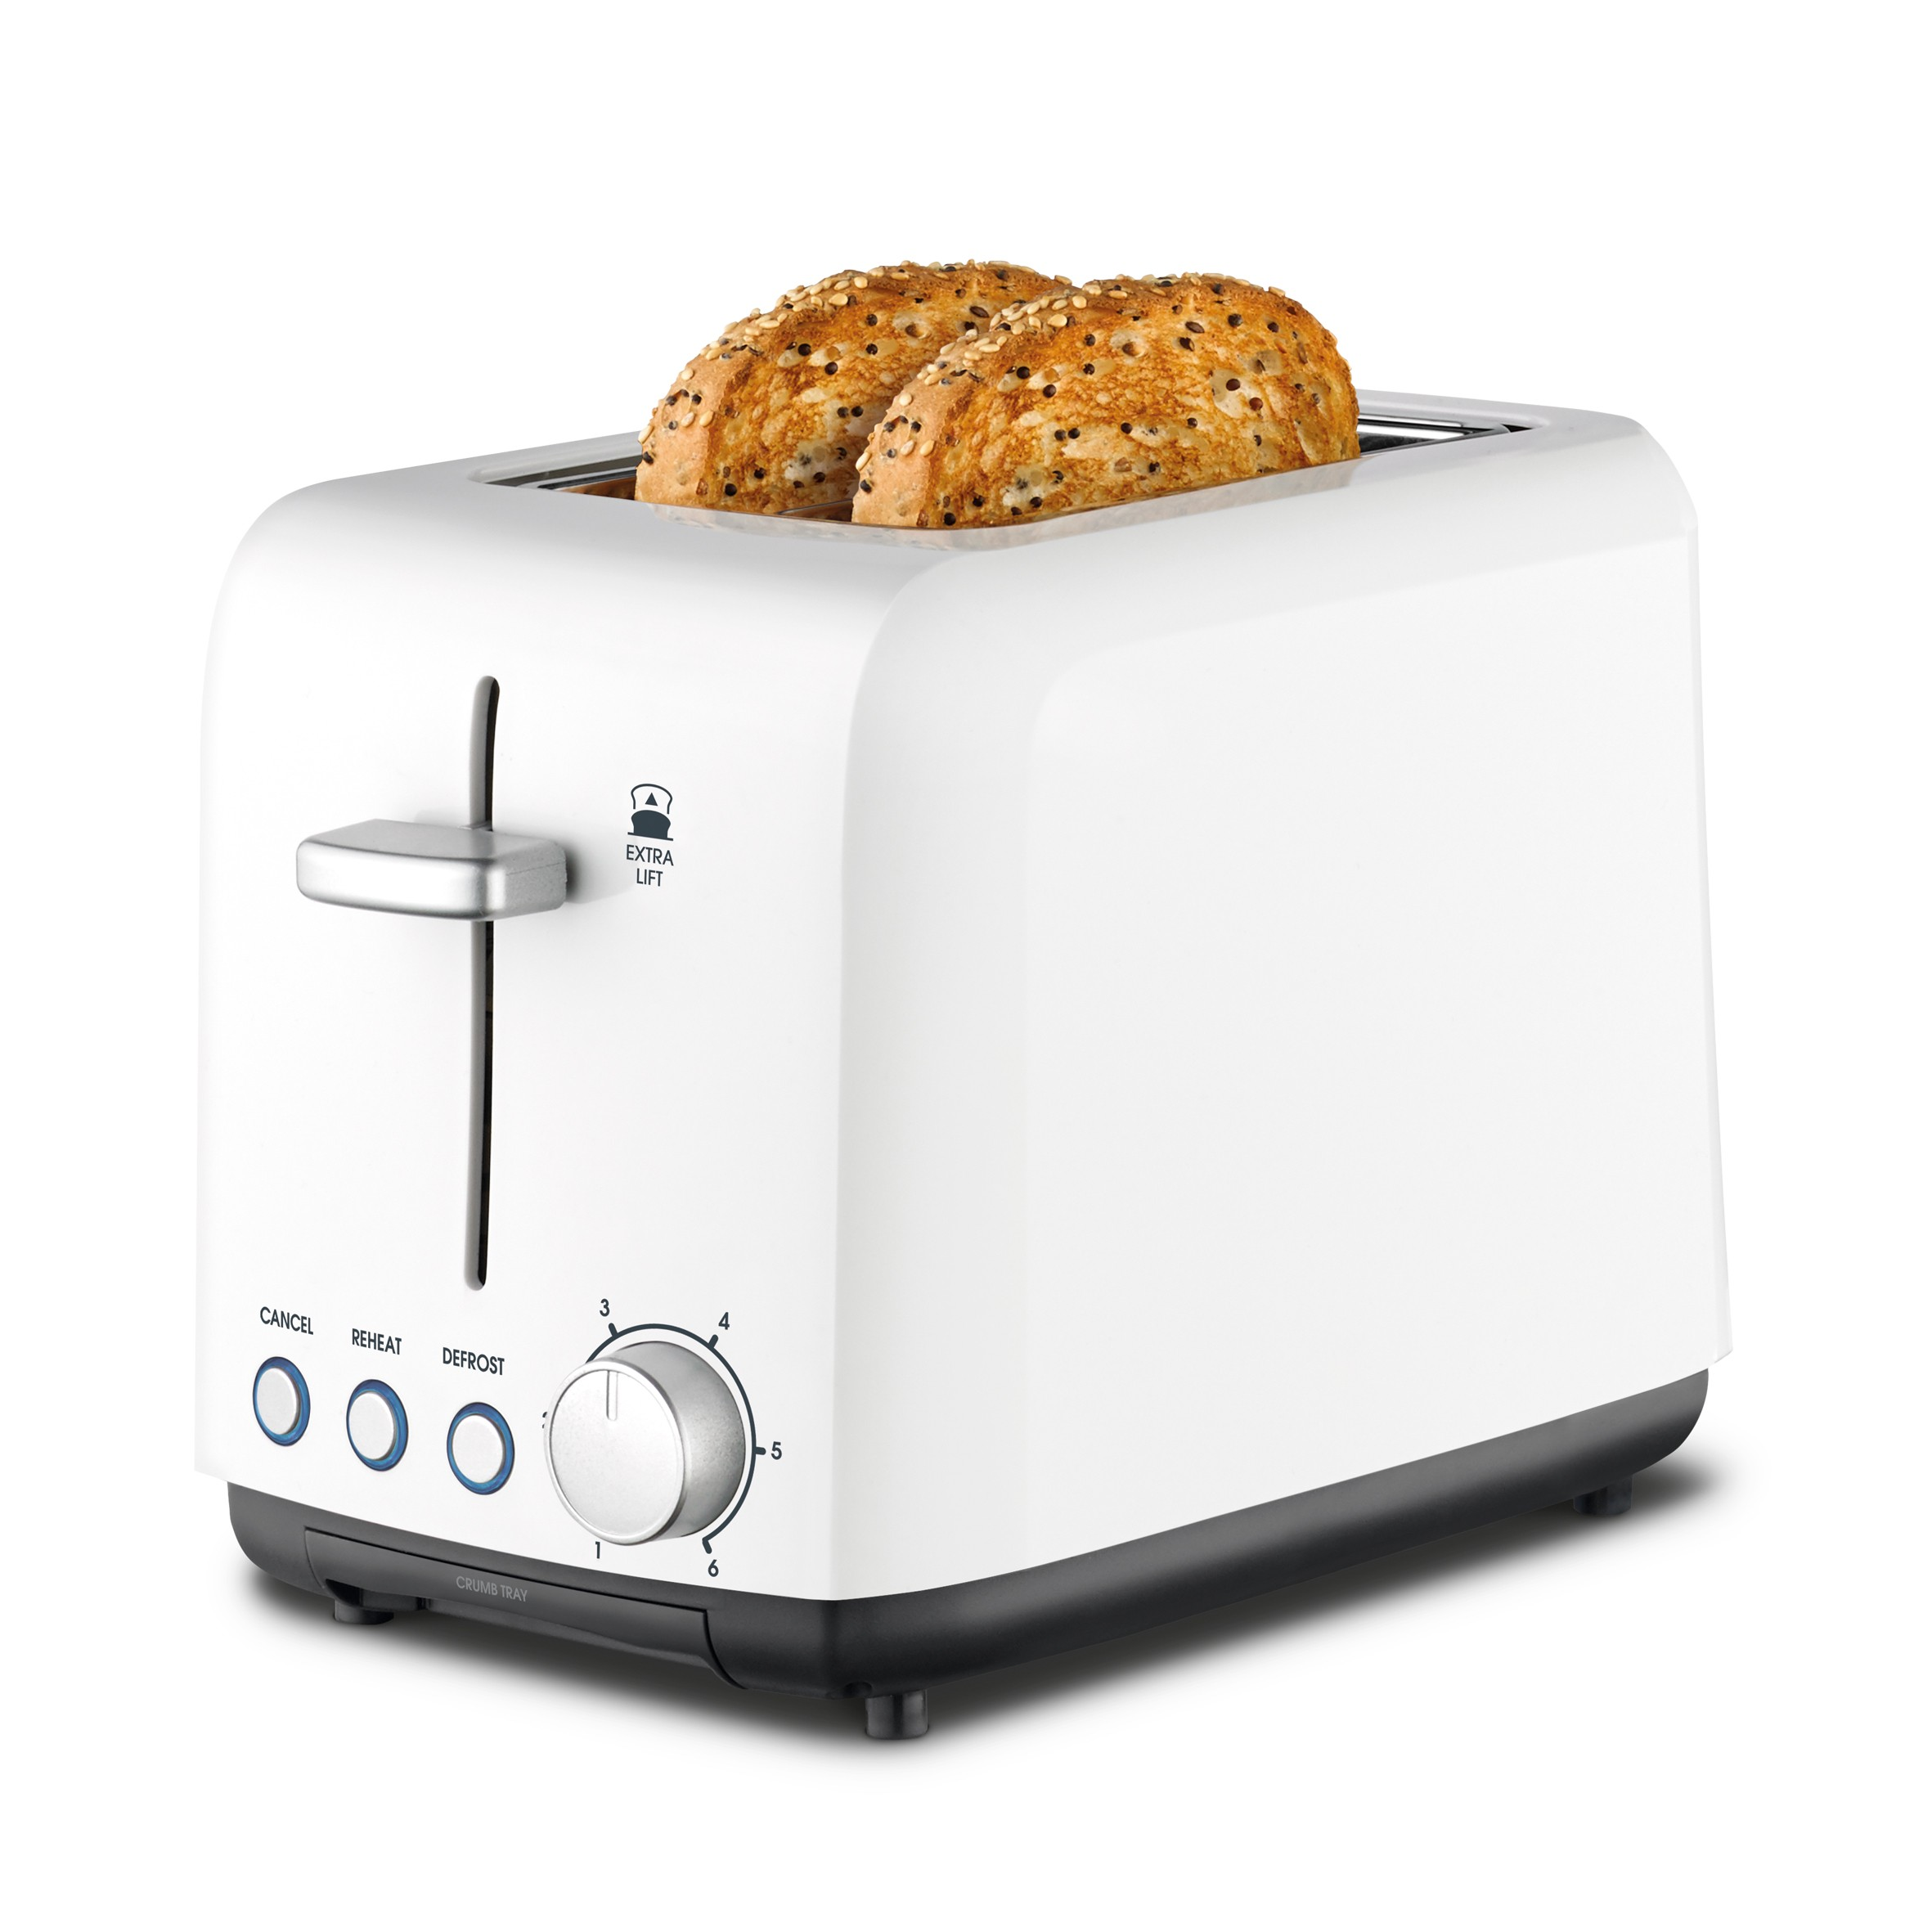 Kambrook - Small Kitchen Appliances - The Good Guys